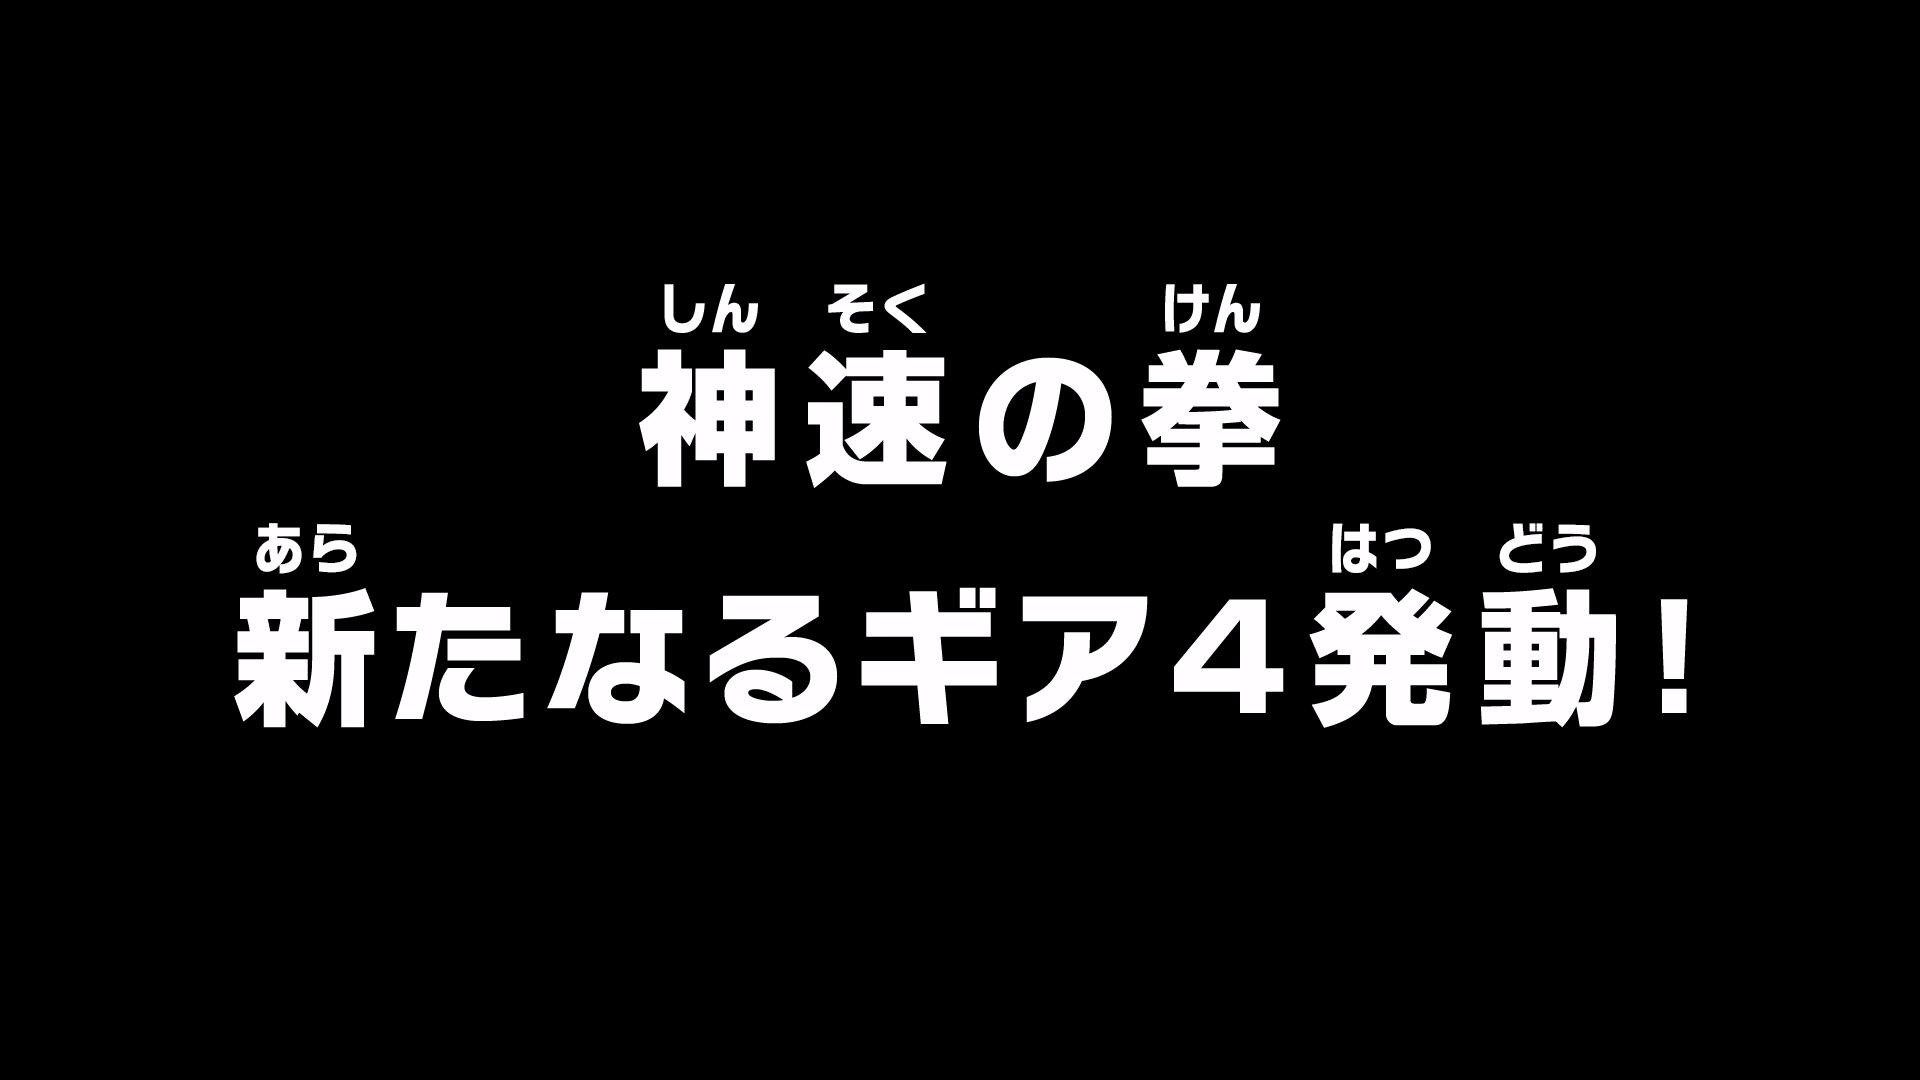 Episode 870